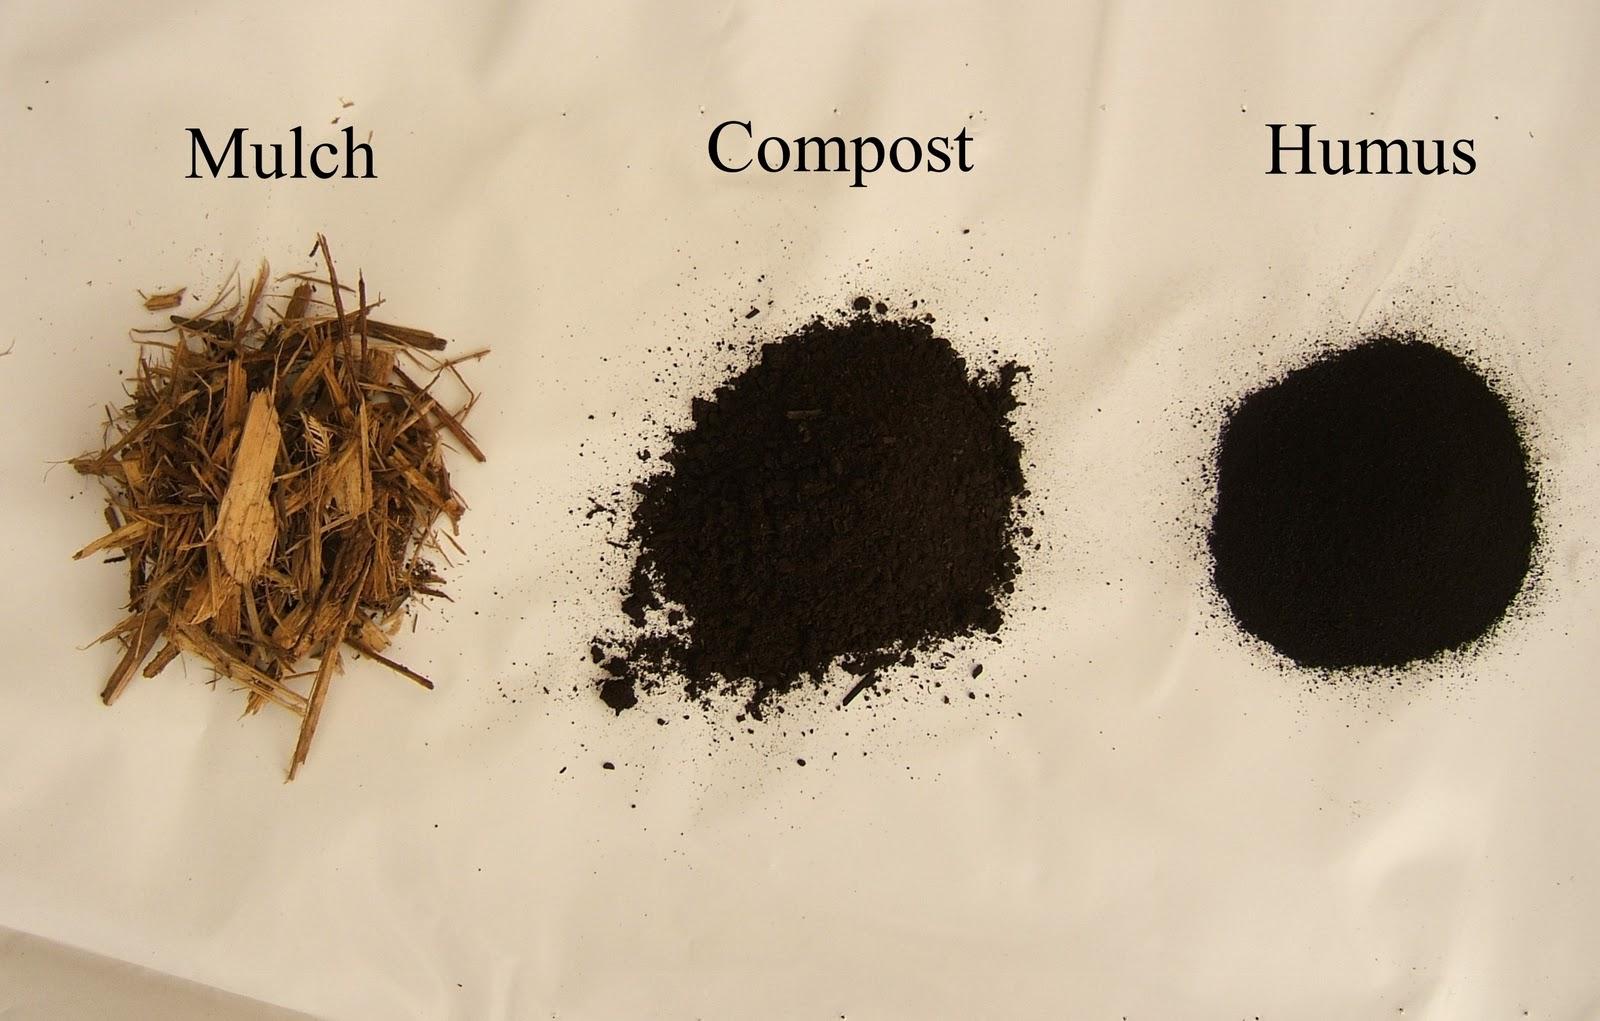 Trees that please nursery january 2012 for Mineral soil vs organic soil